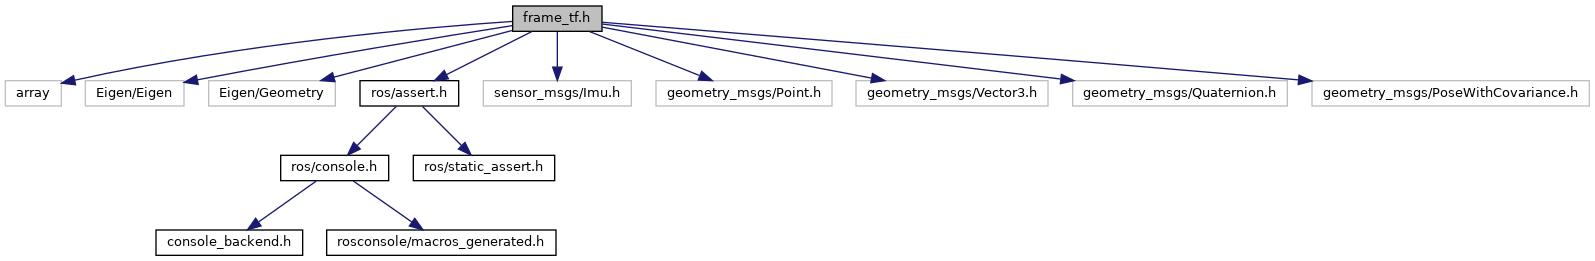 mavros: frame_tf h File Reference